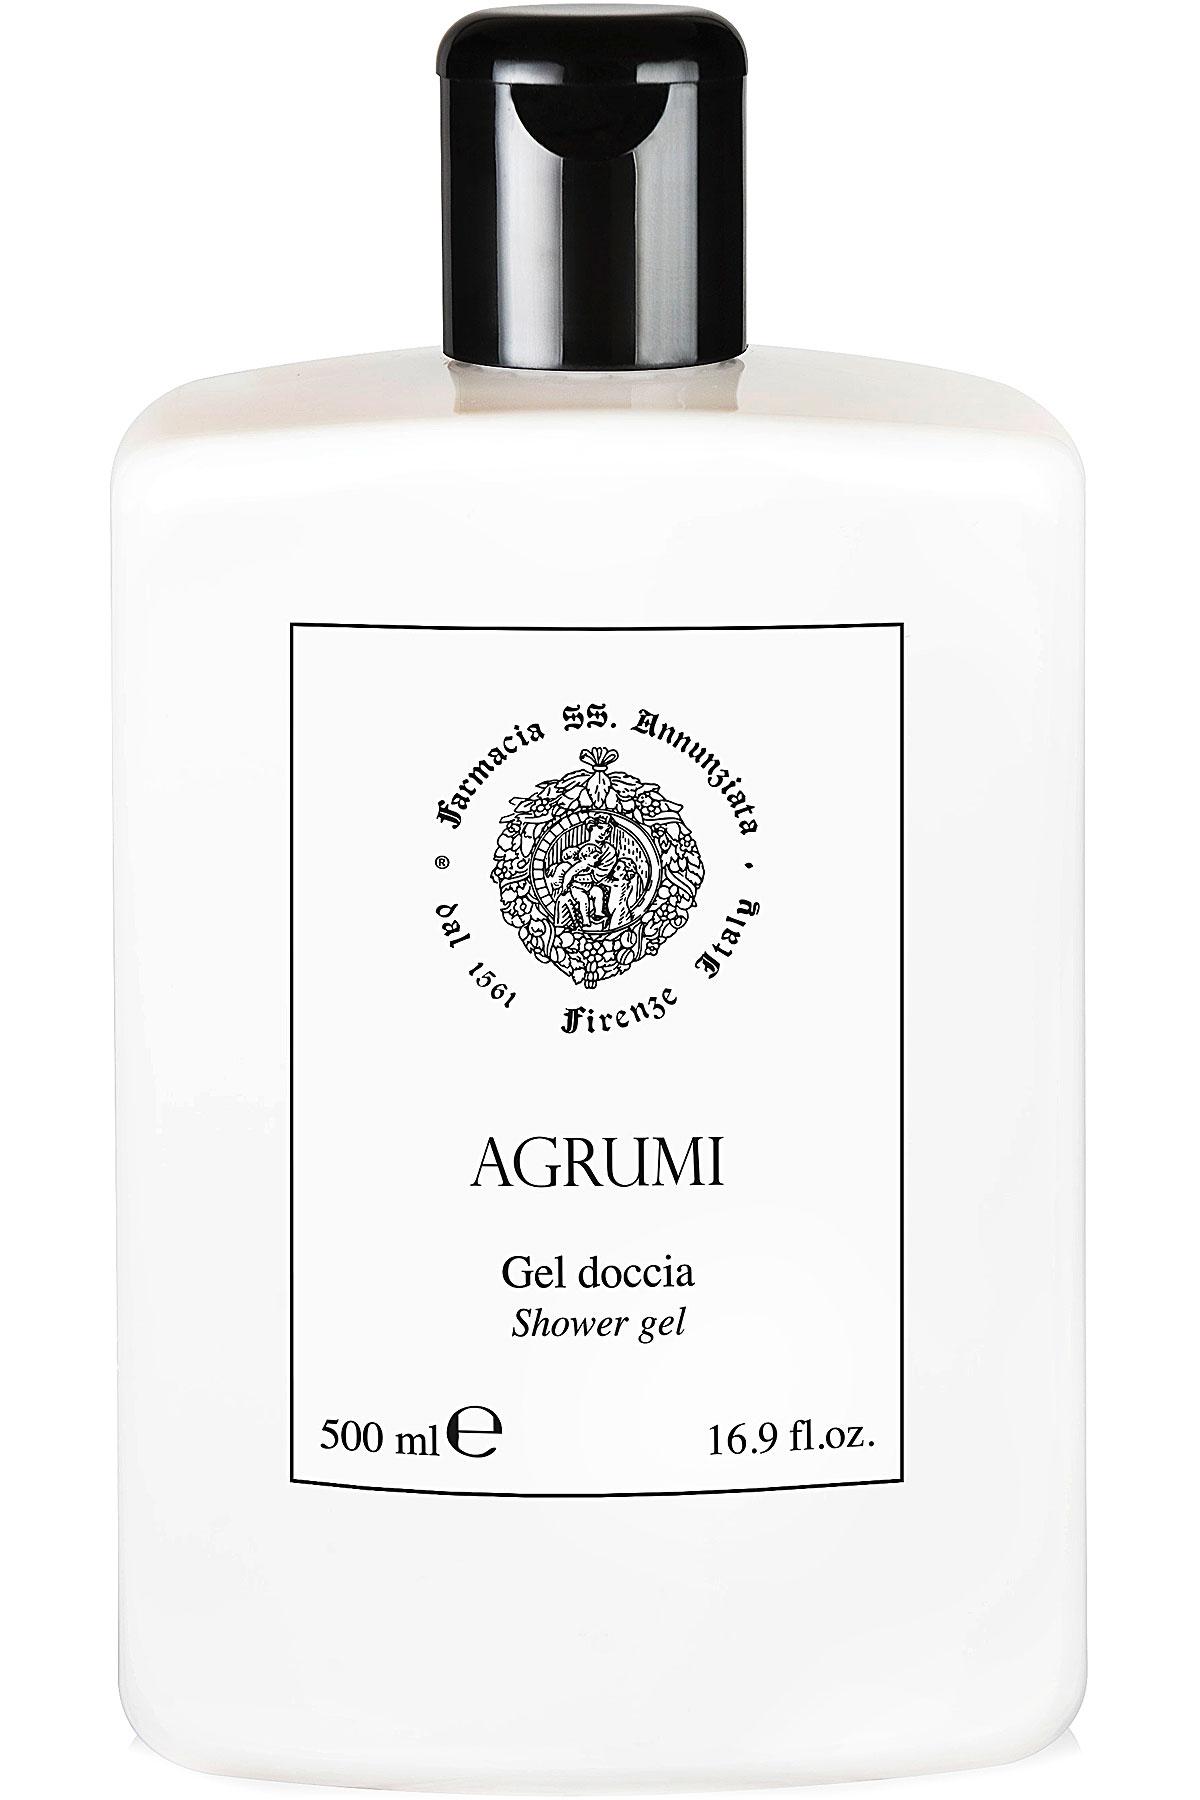 Farmacia Ss Annunziata 1561 Beauty for Women On Sale, Agrumi - Shower Gel - 500 Ml, 2019, 500 ml